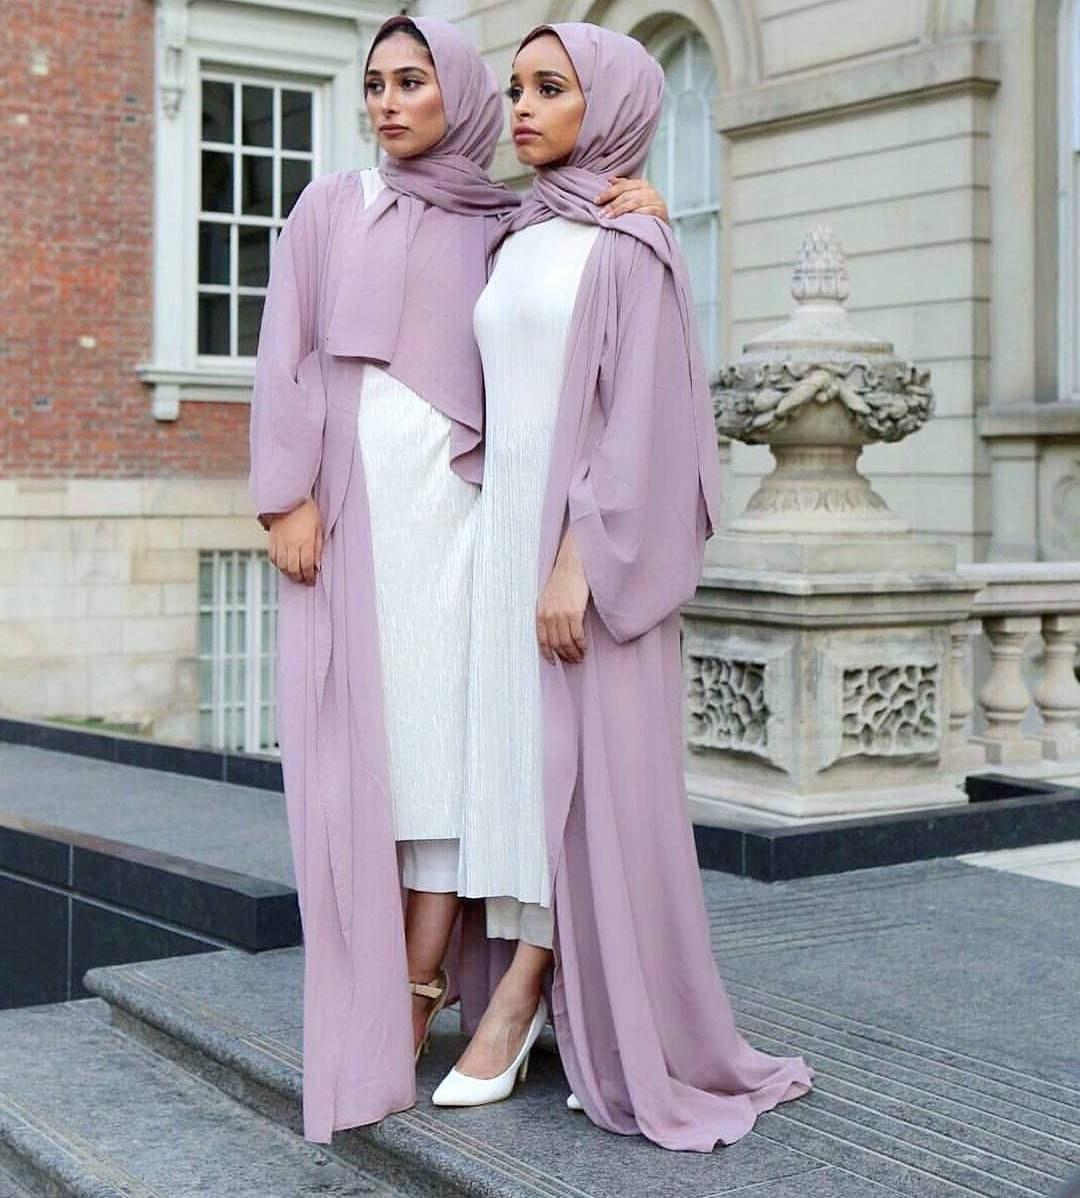 Design Model Baju Lebaran Tahun Ini Tldn 50 Model Baju Lebaran Terbaru 2018 Modern & Elegan